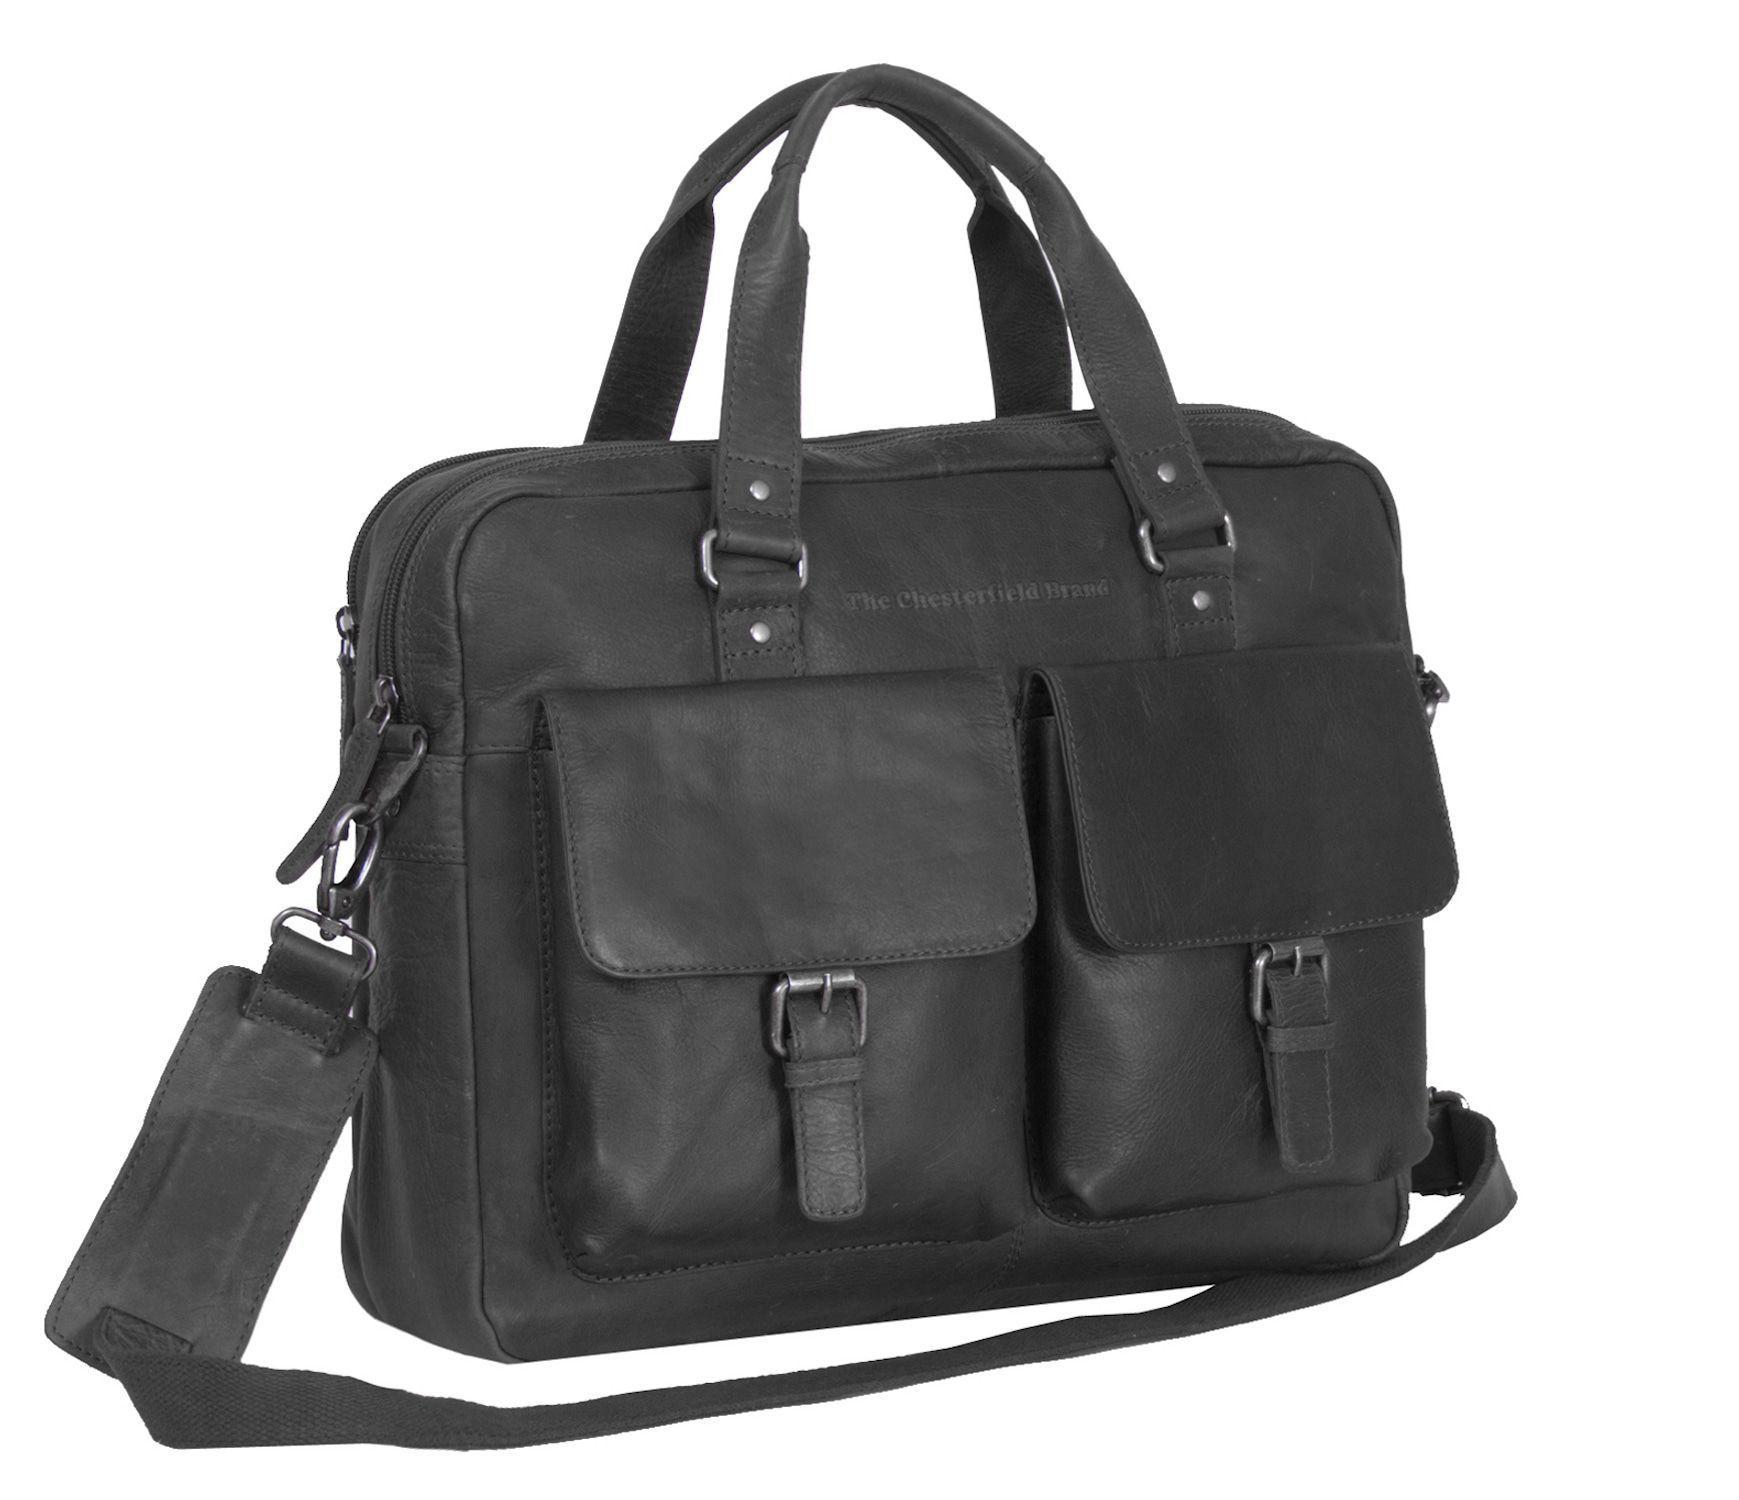 Chesterfield Dylan Businessbag Black 17 inch